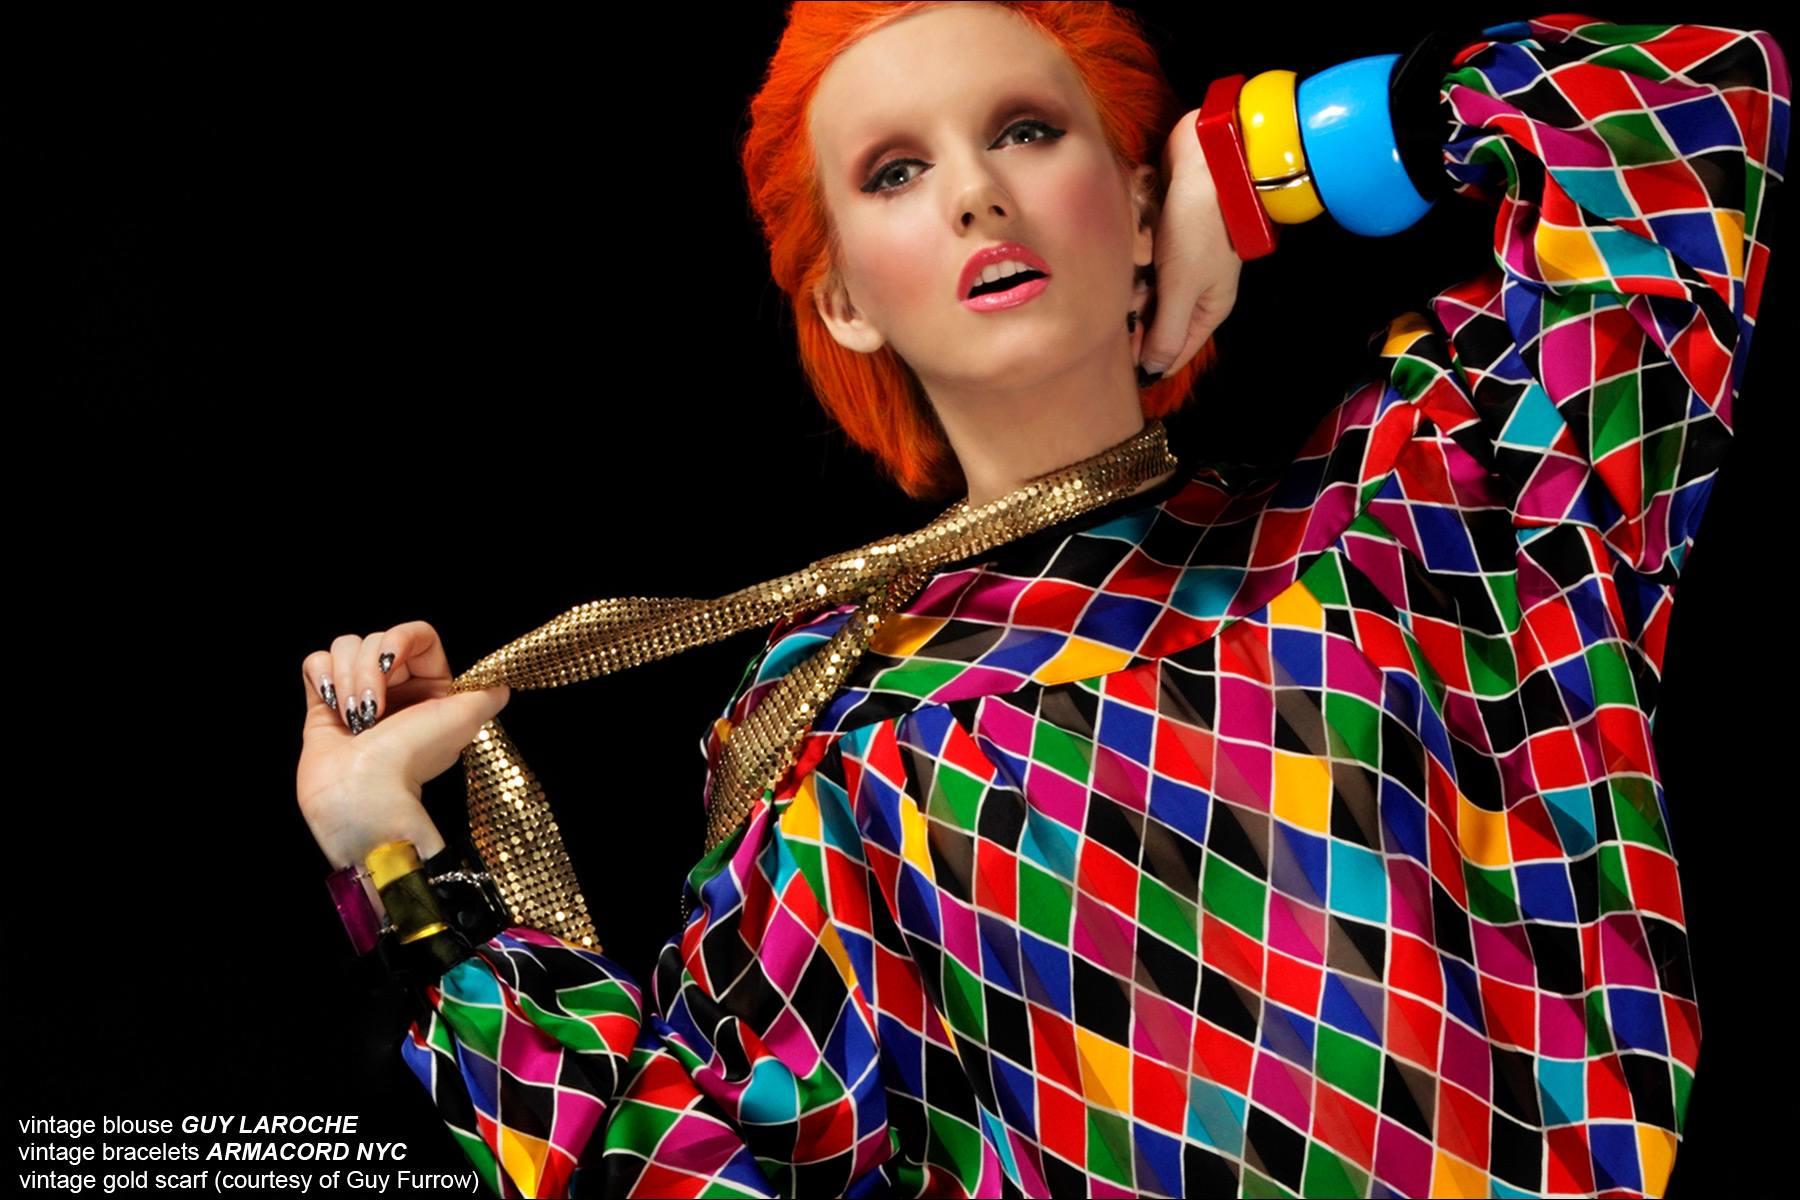 Angela Bowie style for Ponyboy Magazine women's editorial